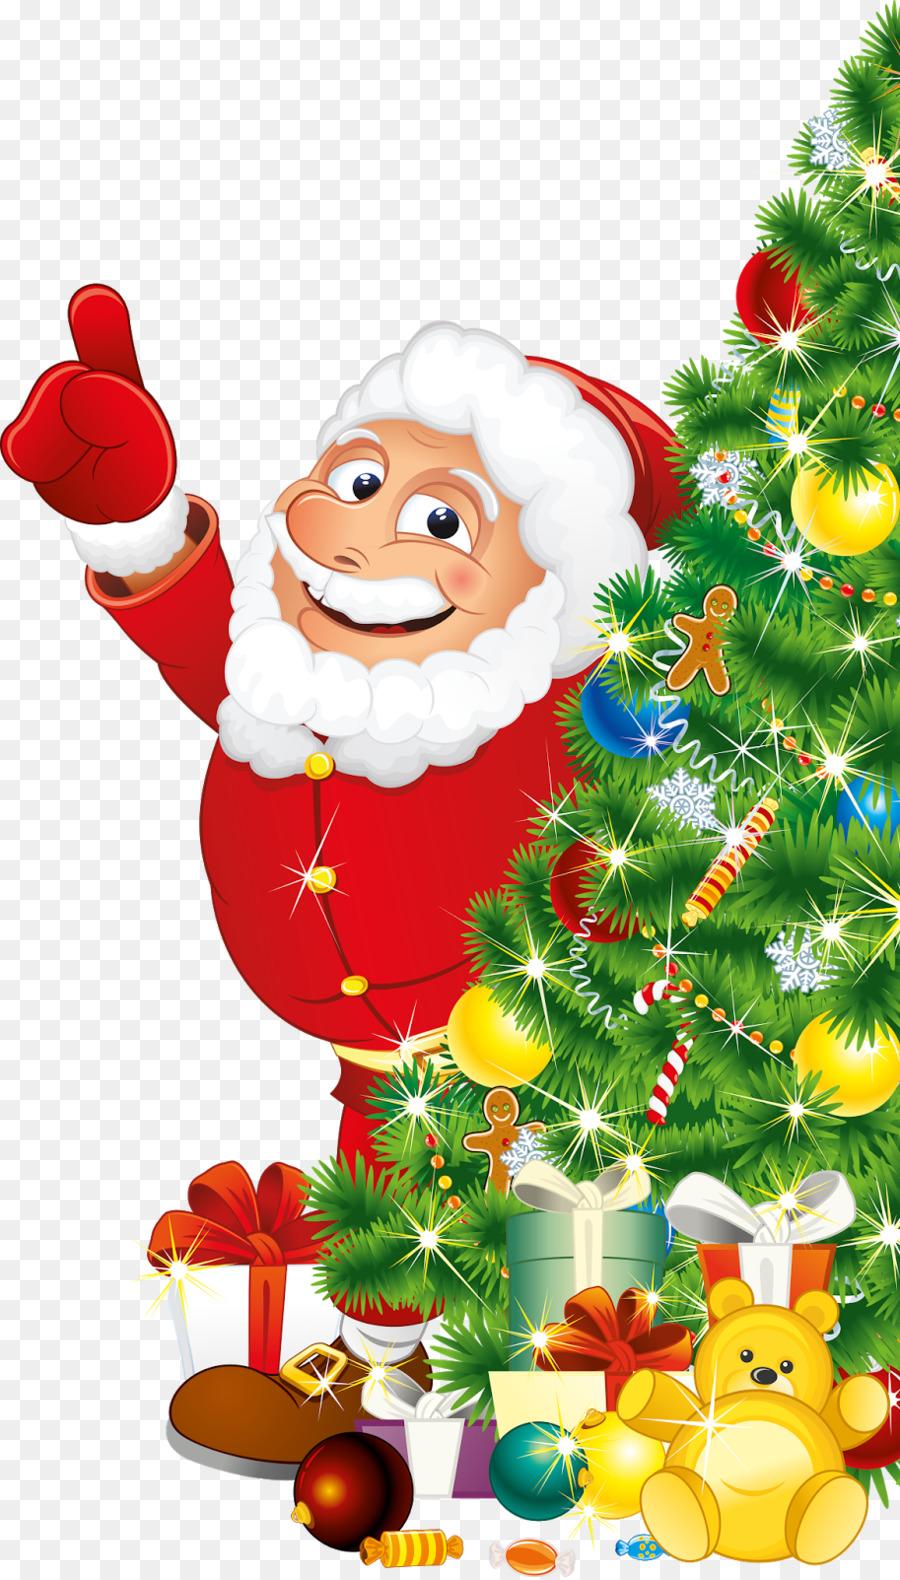 Santa Claus Christmas Card Clip Art Saint Nicholas Png Download